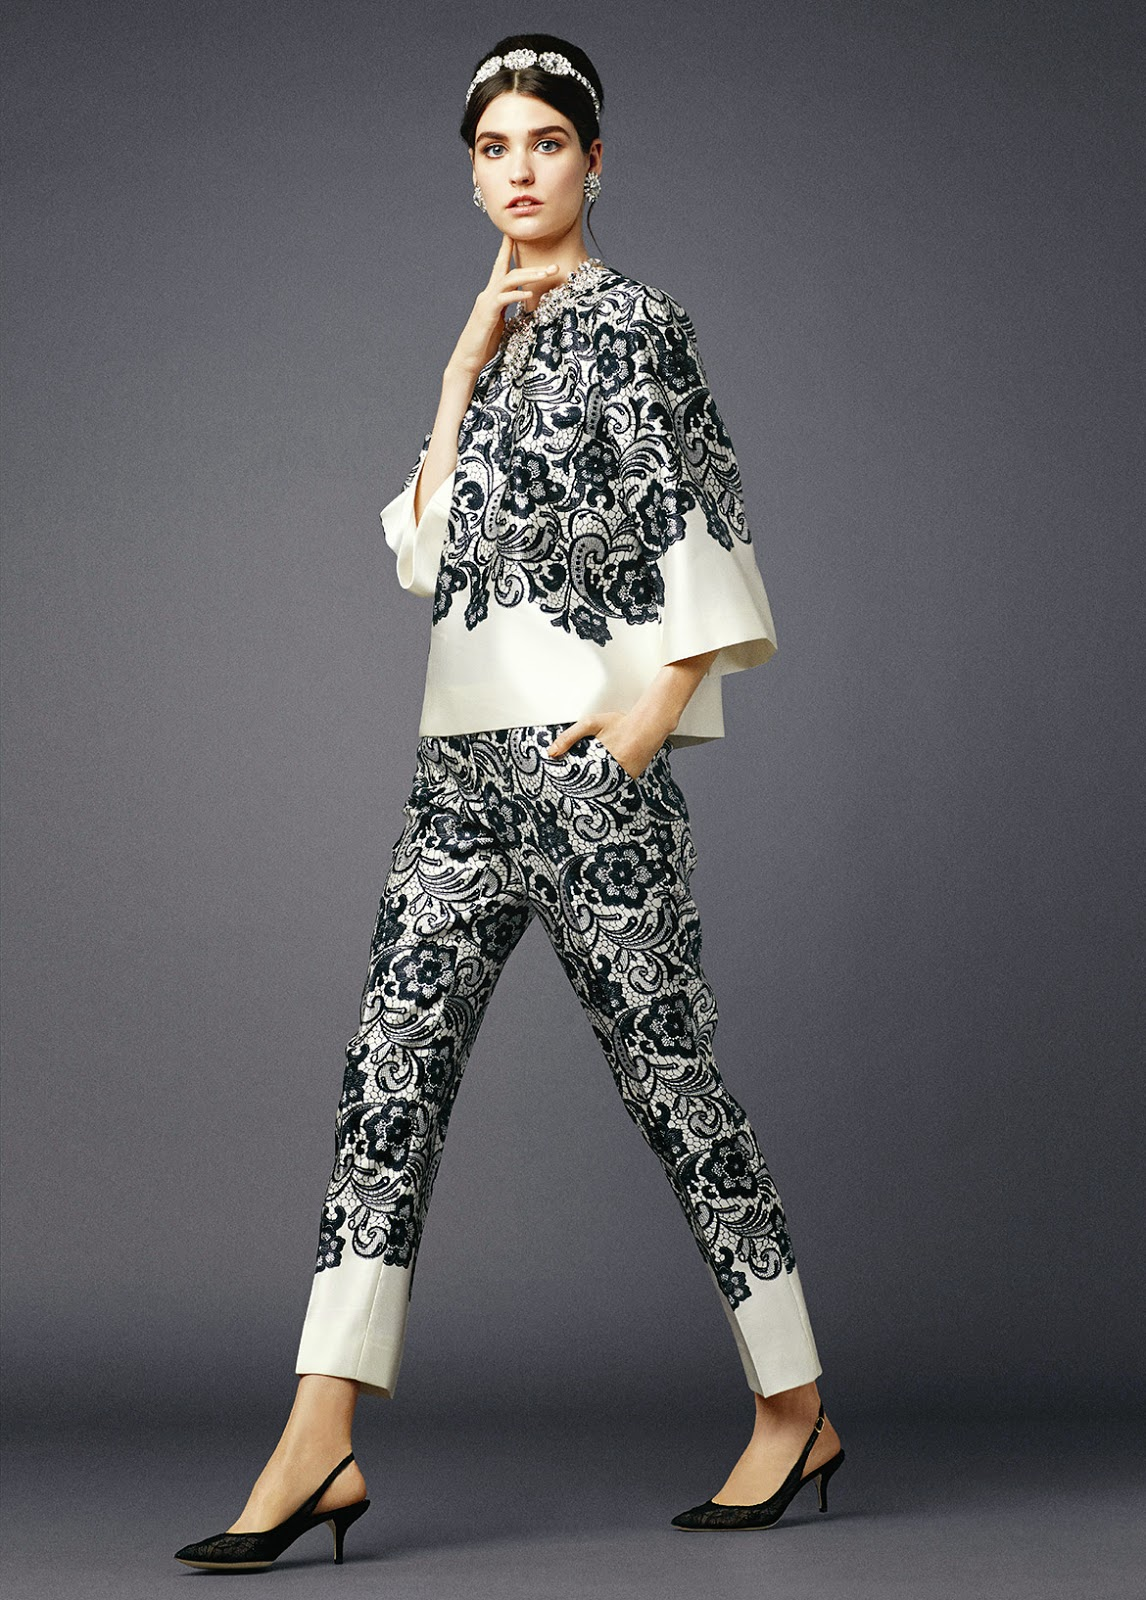 Fashion 2014 Dolce Gabbana Spring Summer 2014 Women 39 S Collection Wallpaper Kingdom